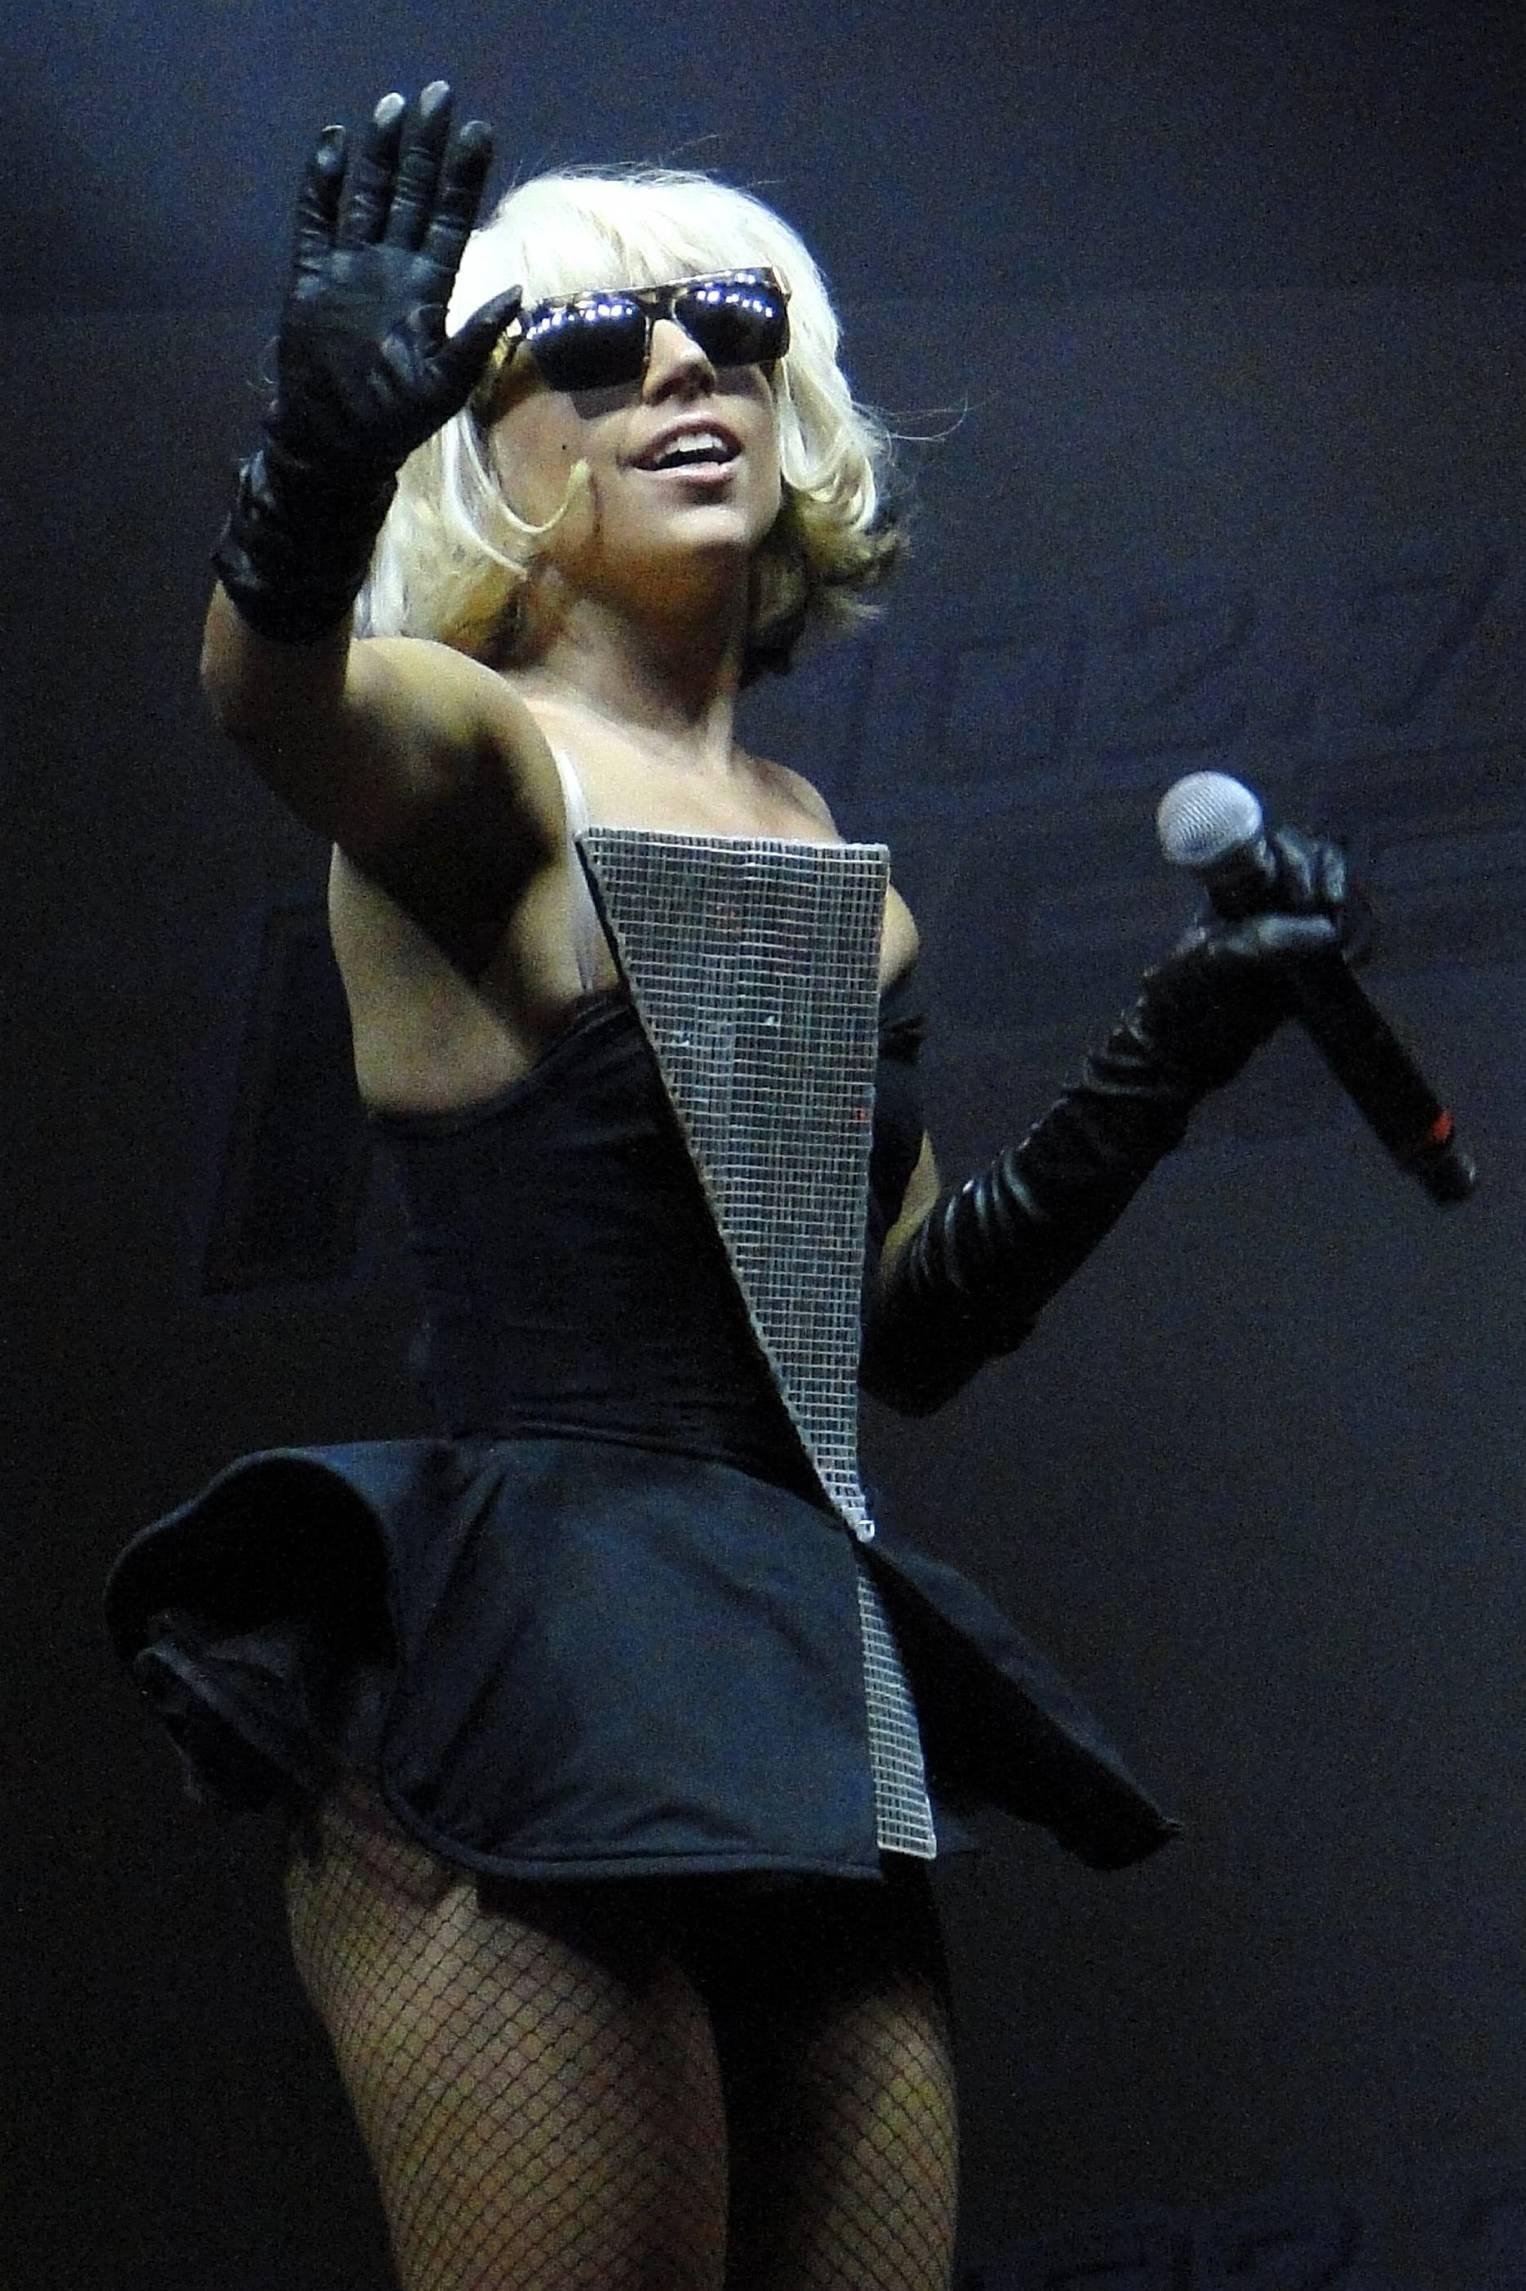 94555_Lady_Gaga_performs_at_KISS_FMs_Wango_Tango-4_122_47lo.jpg